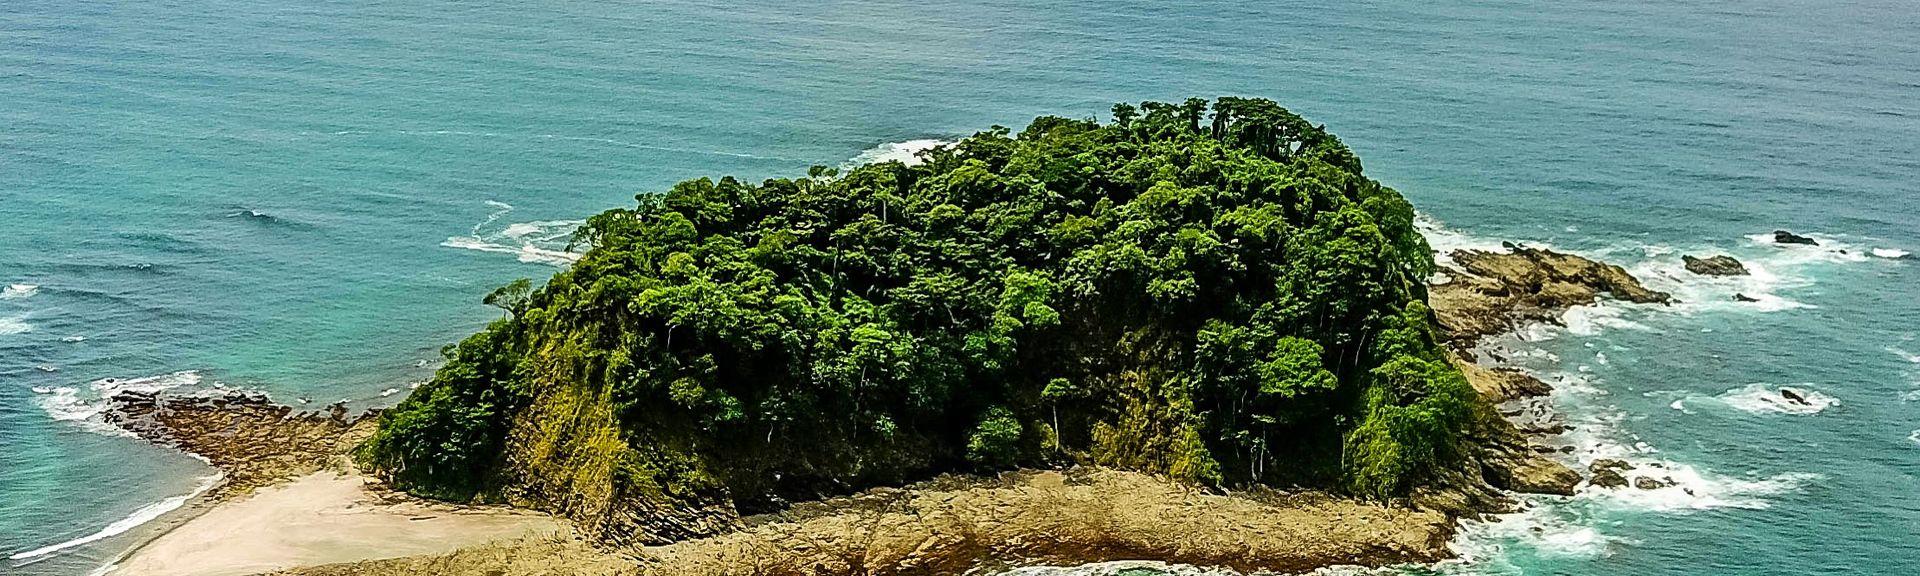 Samara, Guanacaste, Costa Rica